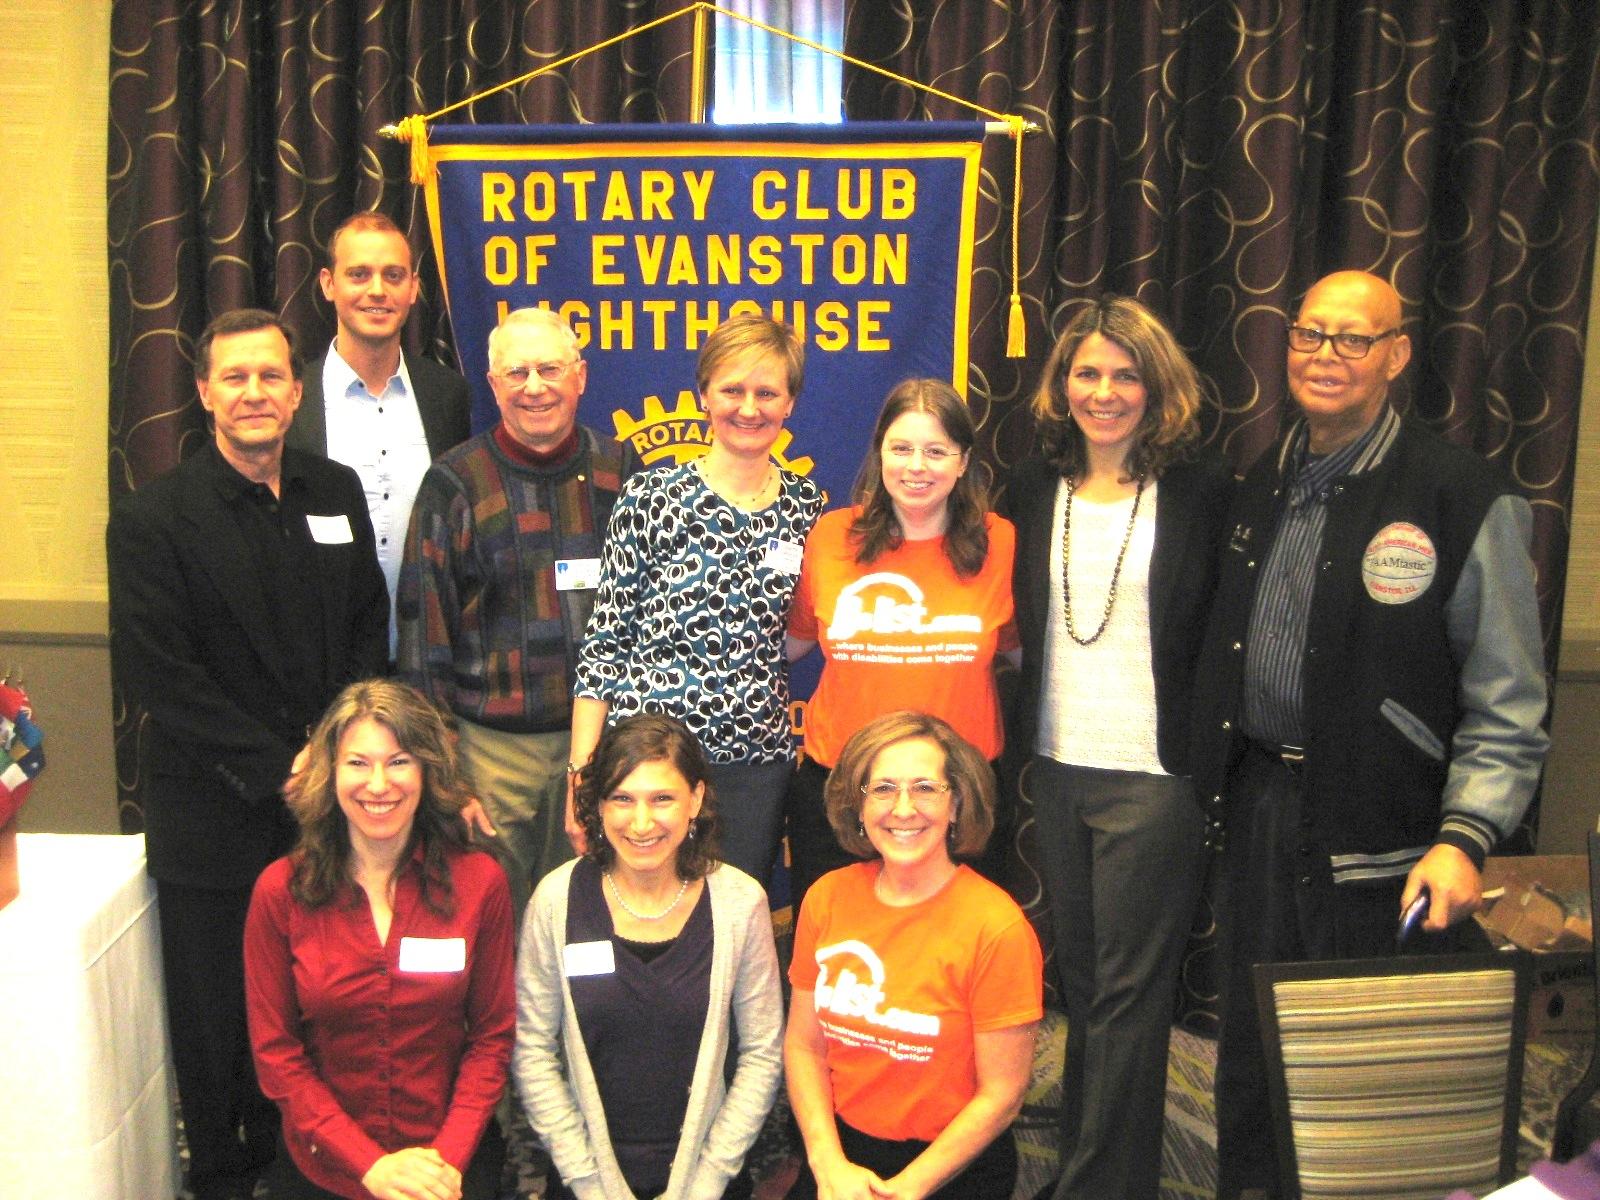 Evanston Lighthouse Rotary Club